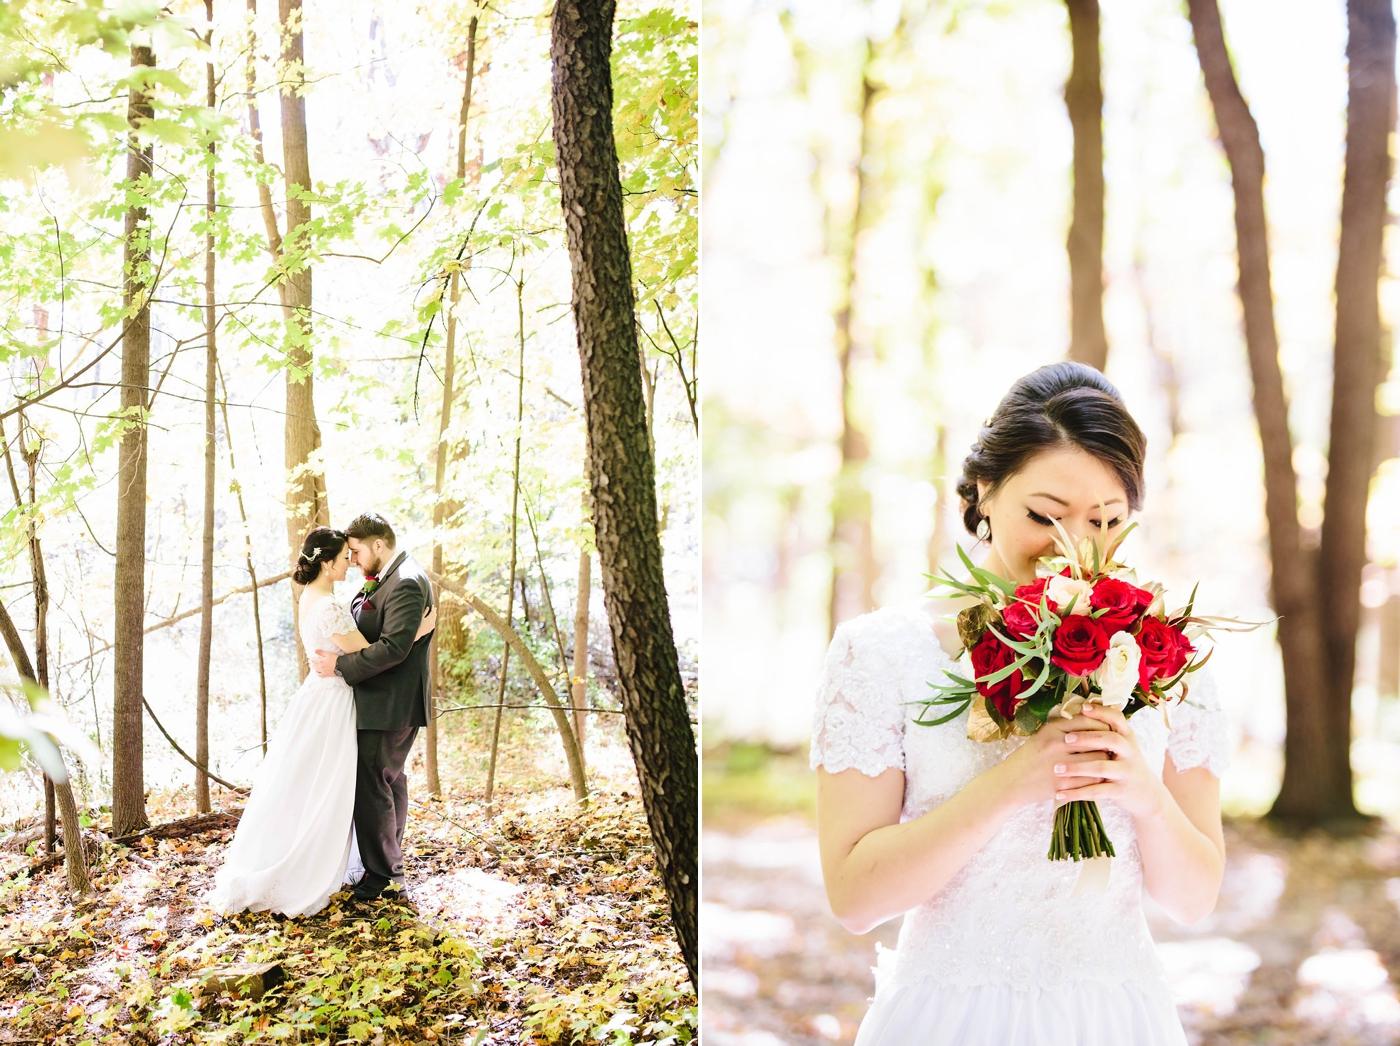 chicago-fine-art-wedding-photography-bolotin12